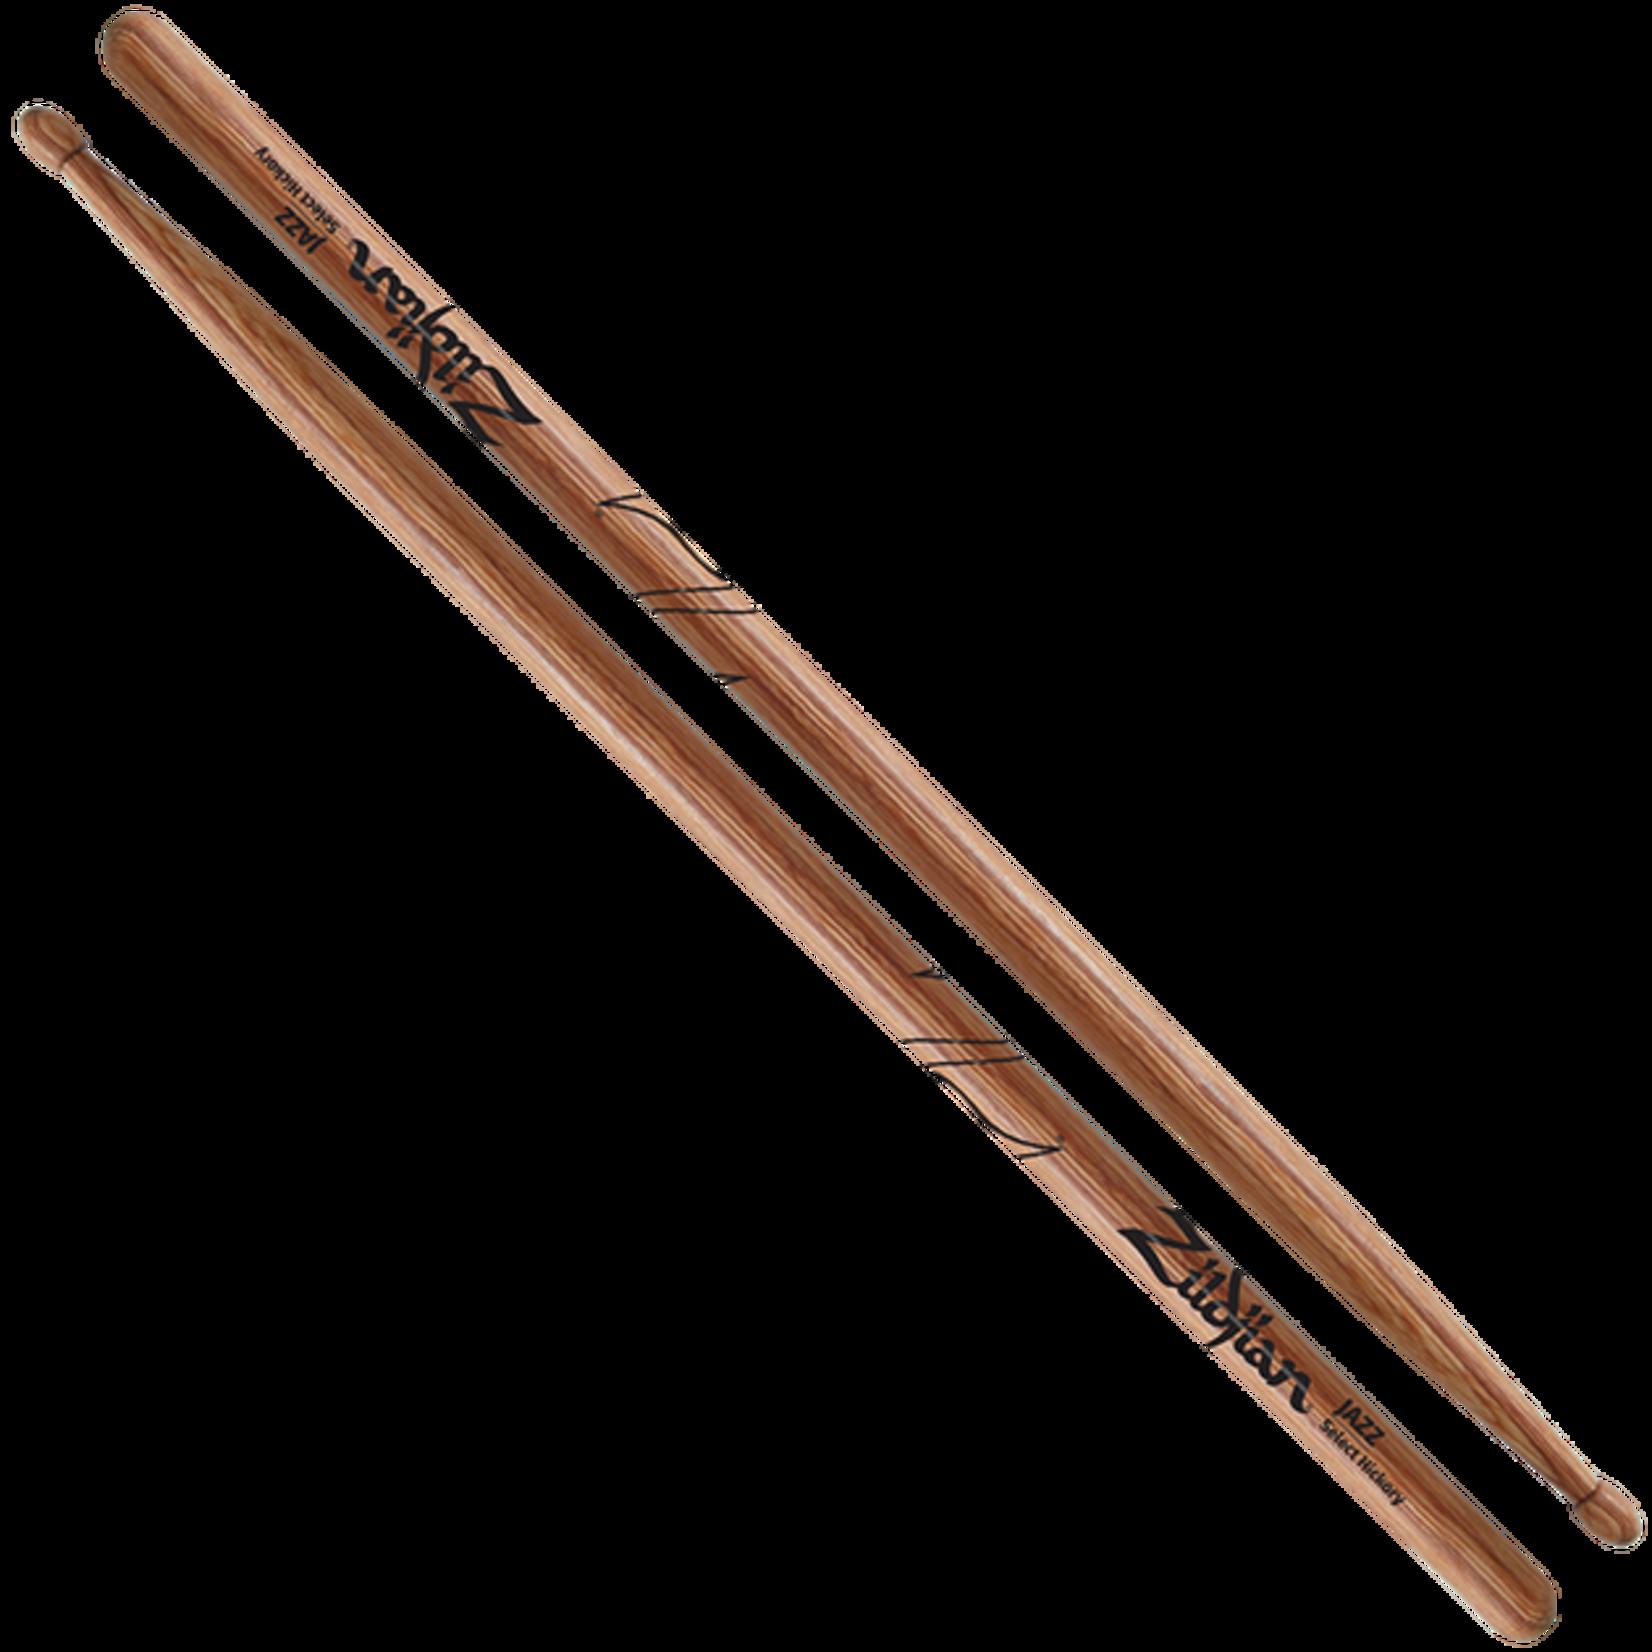 Zildjian Zildjian Heavy Jazz Laminated Birch Drumsticks